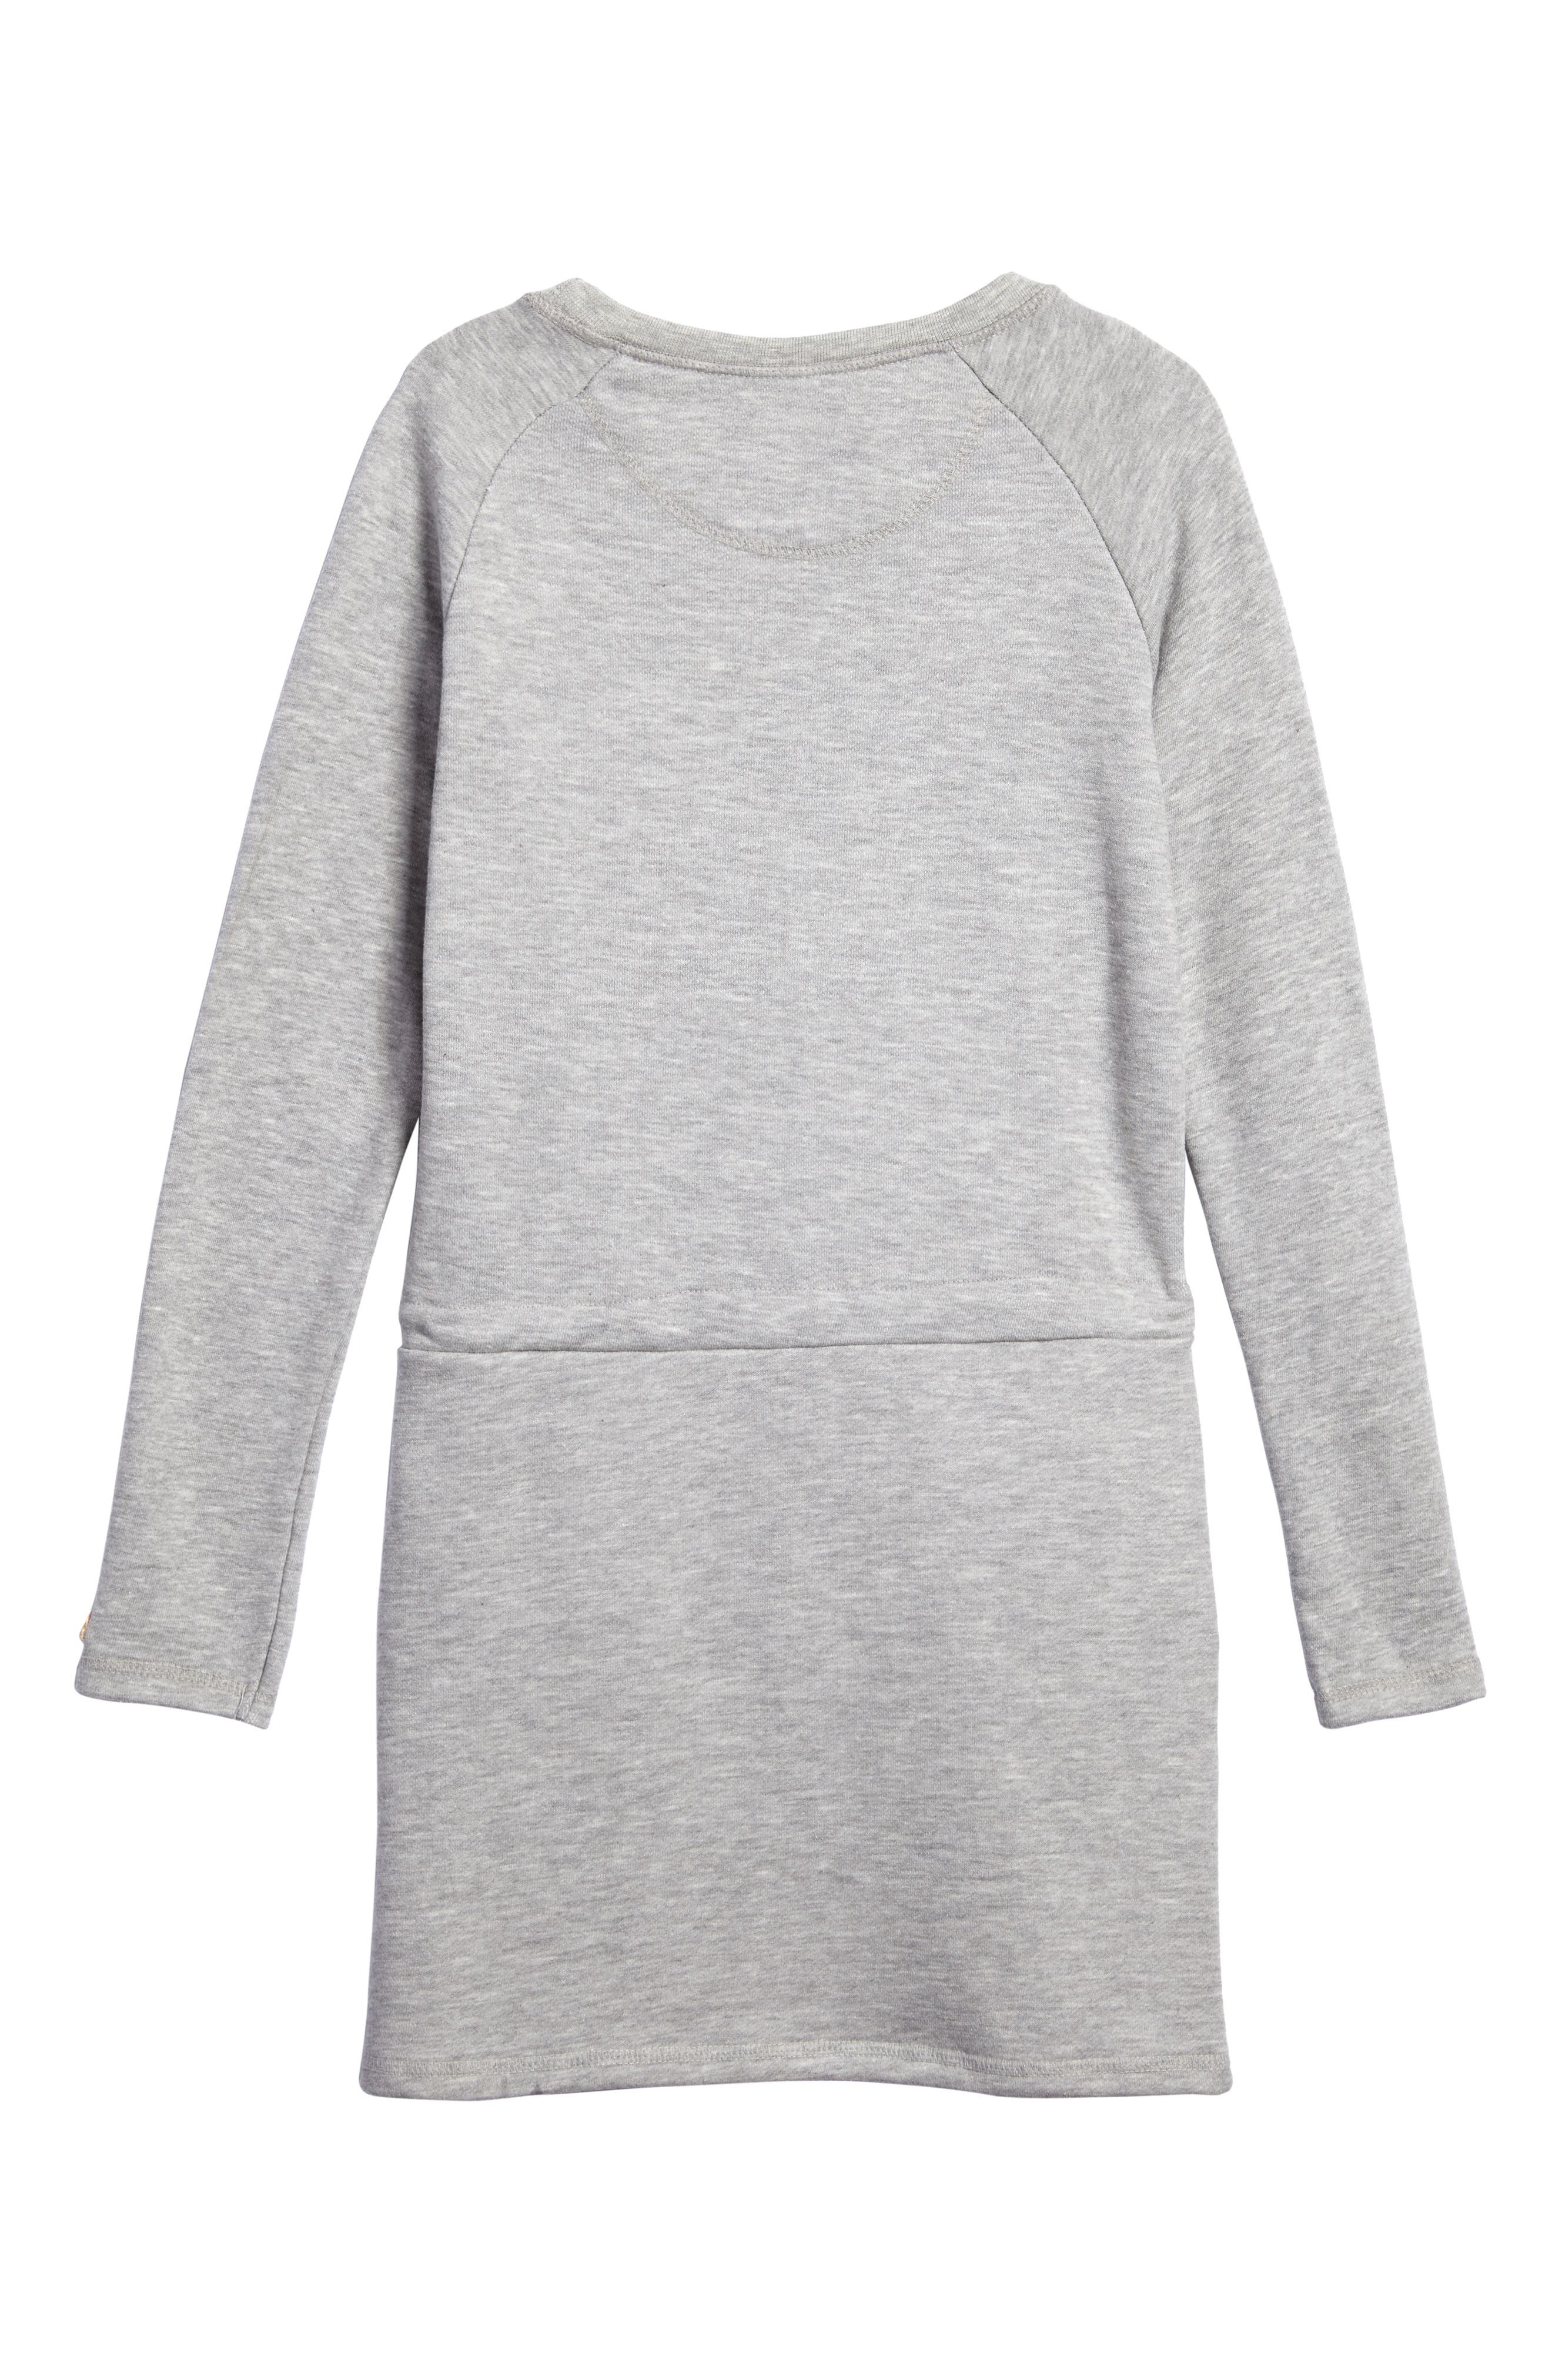 Sweatshirt Dress,                             Alternate thumbnail 2, color,                             Pearl Heather